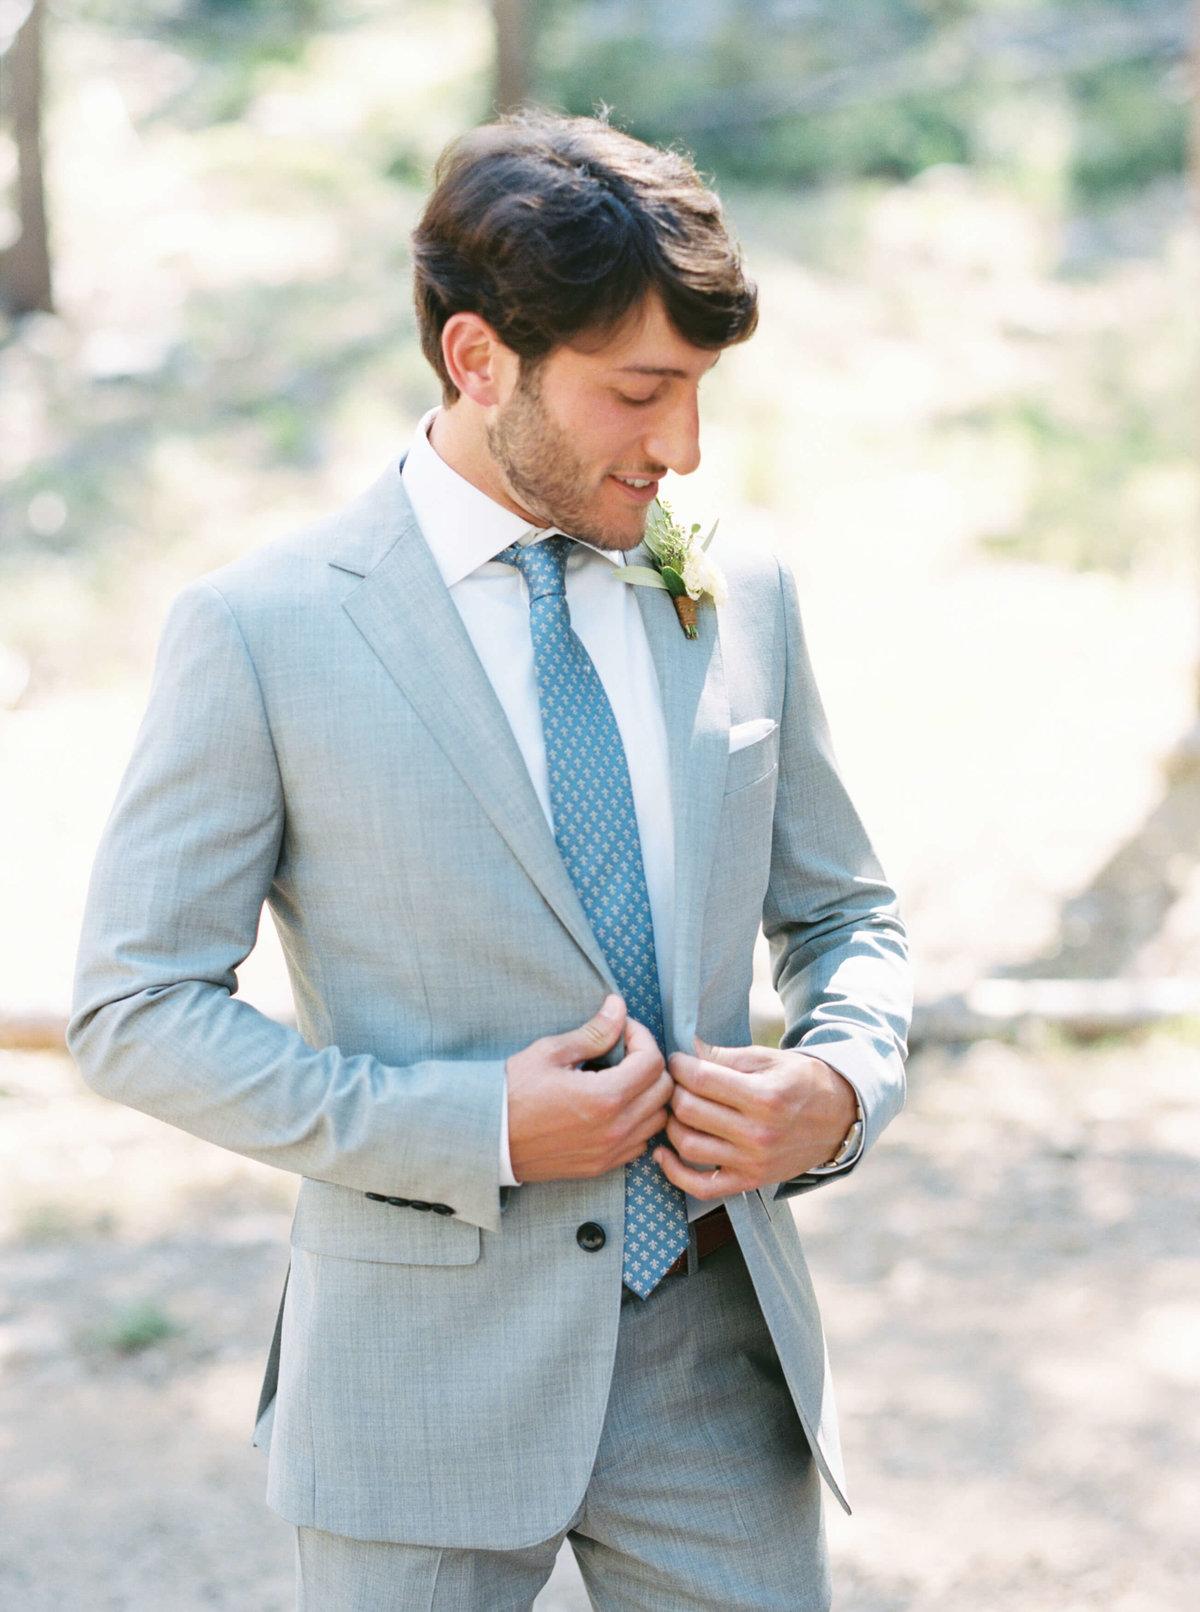 Enchanting Wedding Suit Hire Swindon Inspiration - Wedding Plan ...